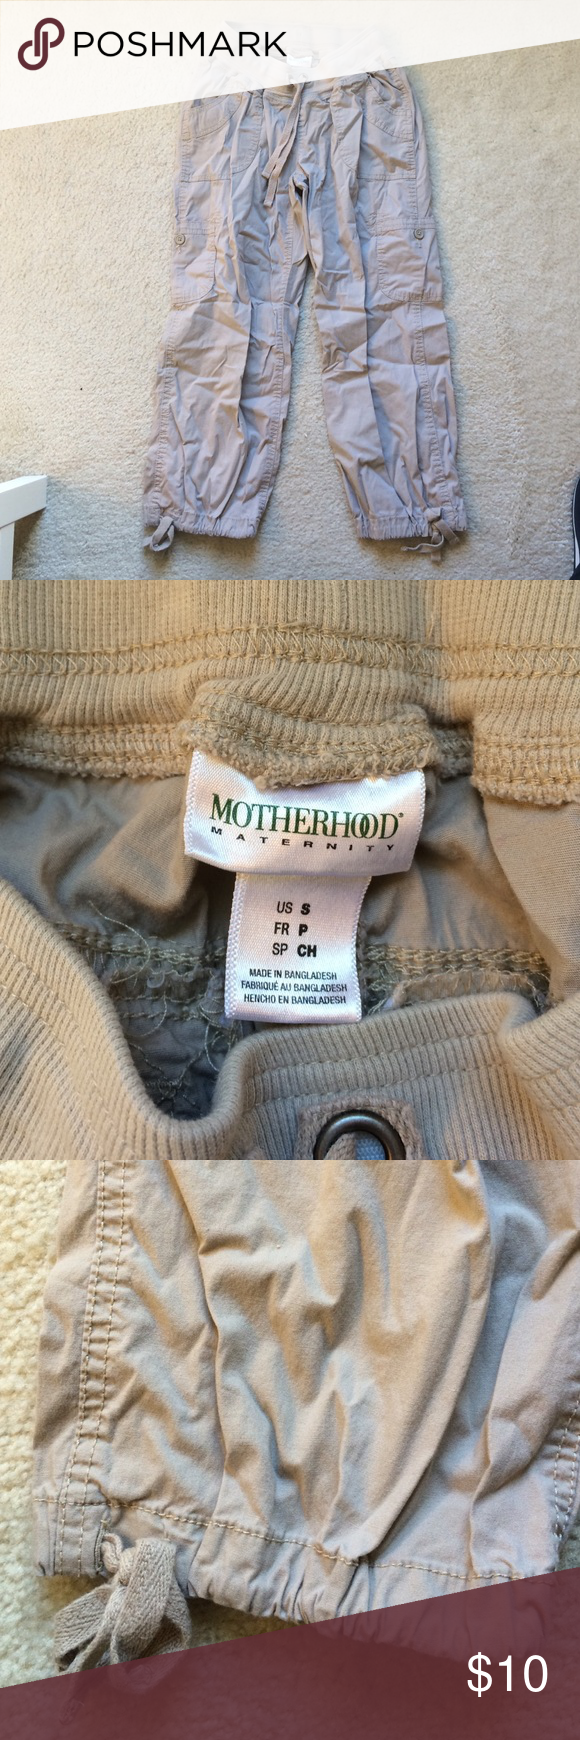 Maternity khaki Capri pants Lots of pockets! Ties at bottom of each pant leg. Motherhood Maternity Pants Capris